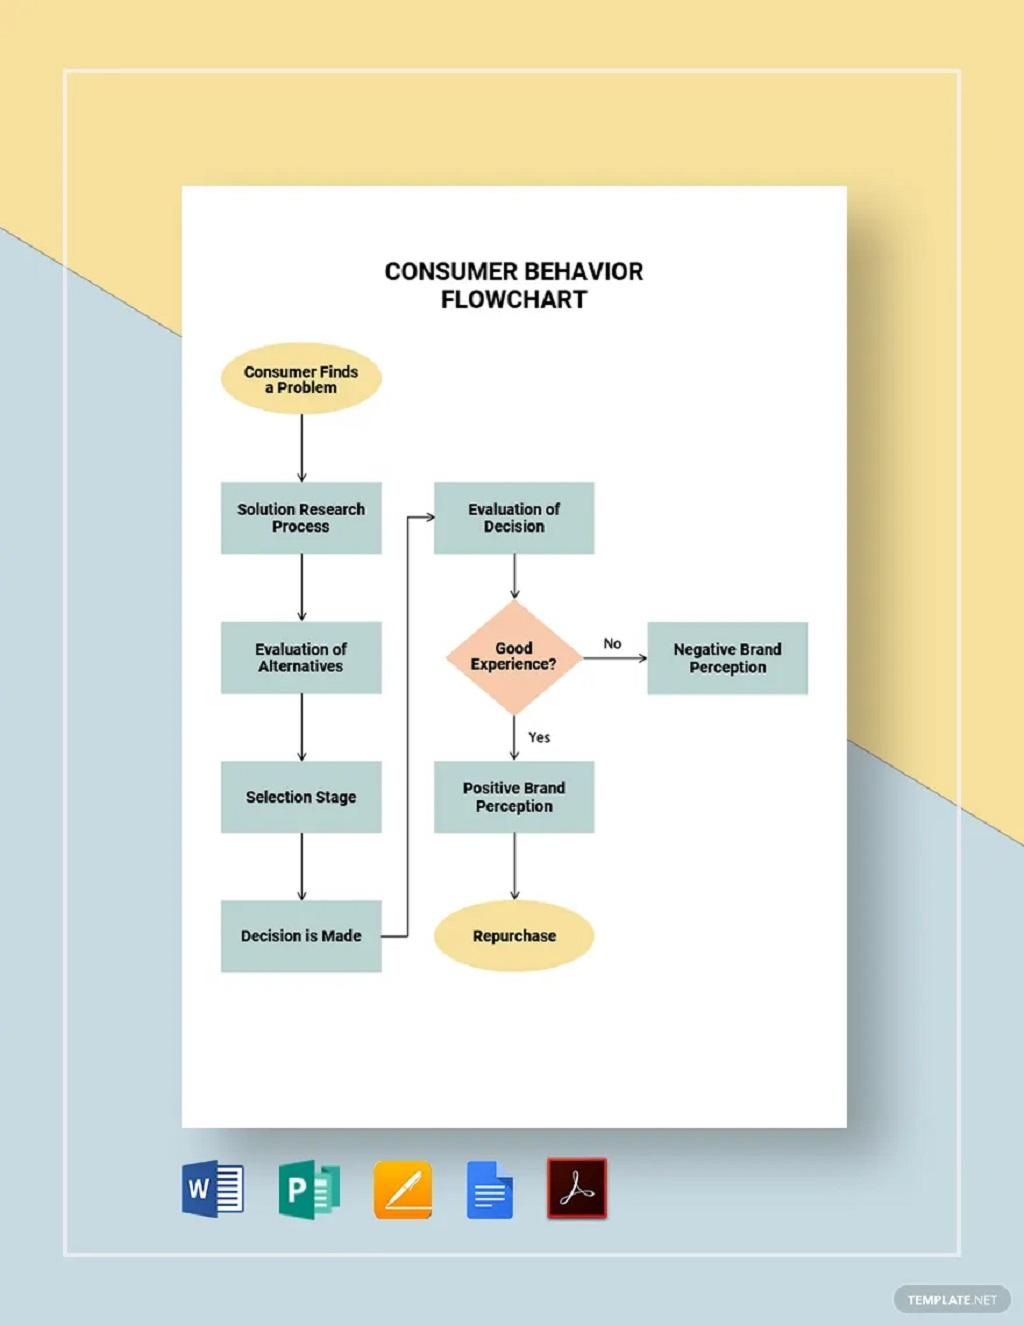 Consumer Behavior Flowchart Template Sample Chart Printable Charts For Home Pdf Preschool Teachers Classroom  Samples Large